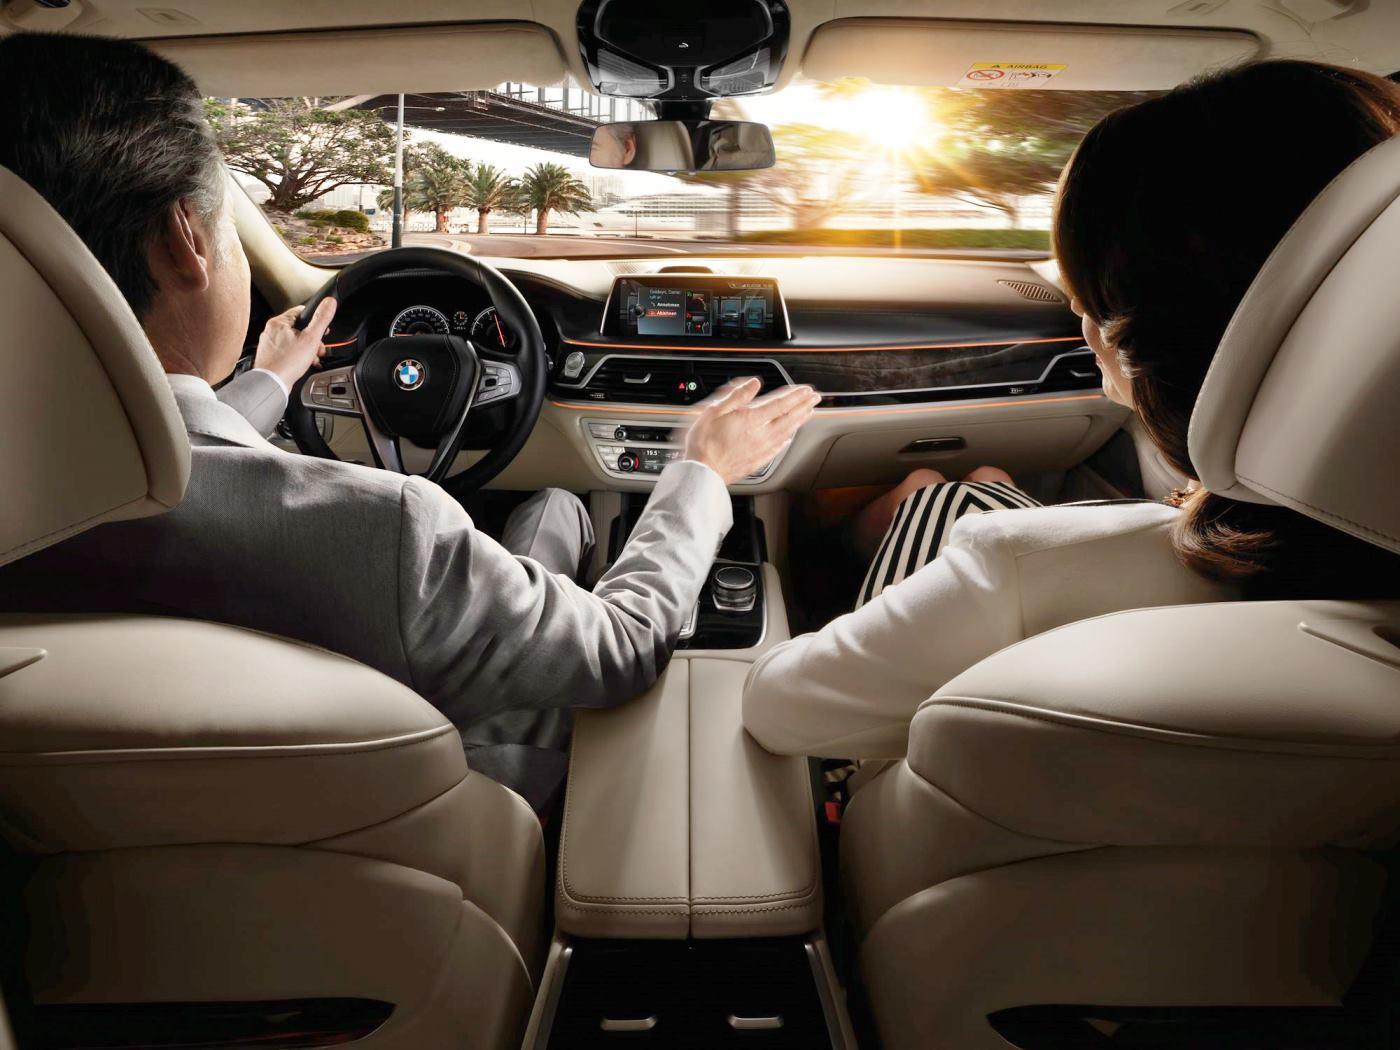 2016 BMW 7 Series Interior Photos 22